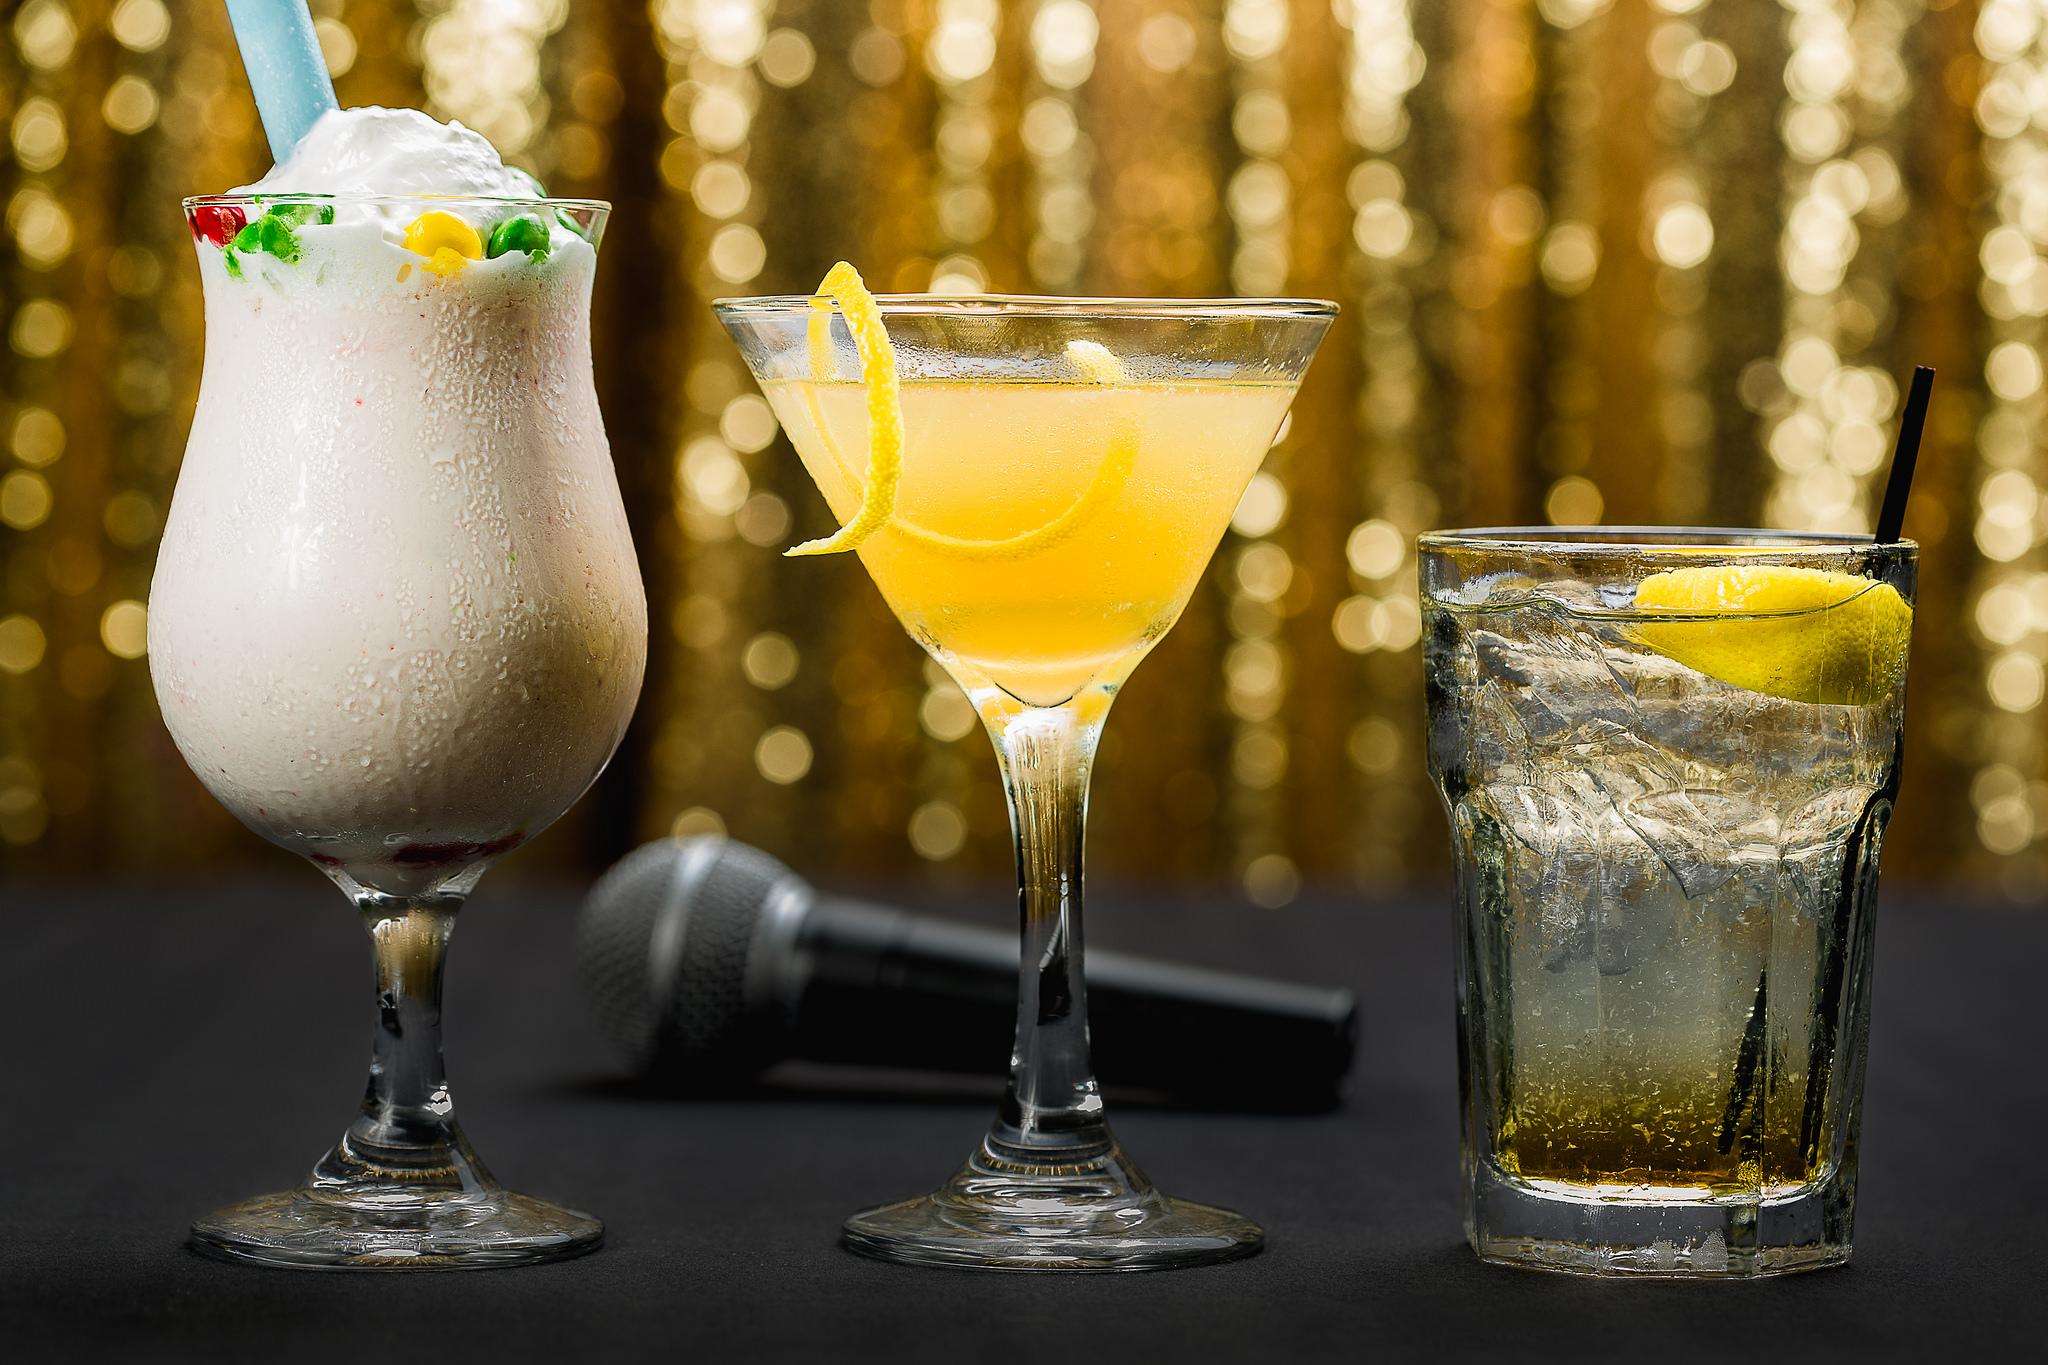 Adult Milk Shake, Cocktails, and Spirits